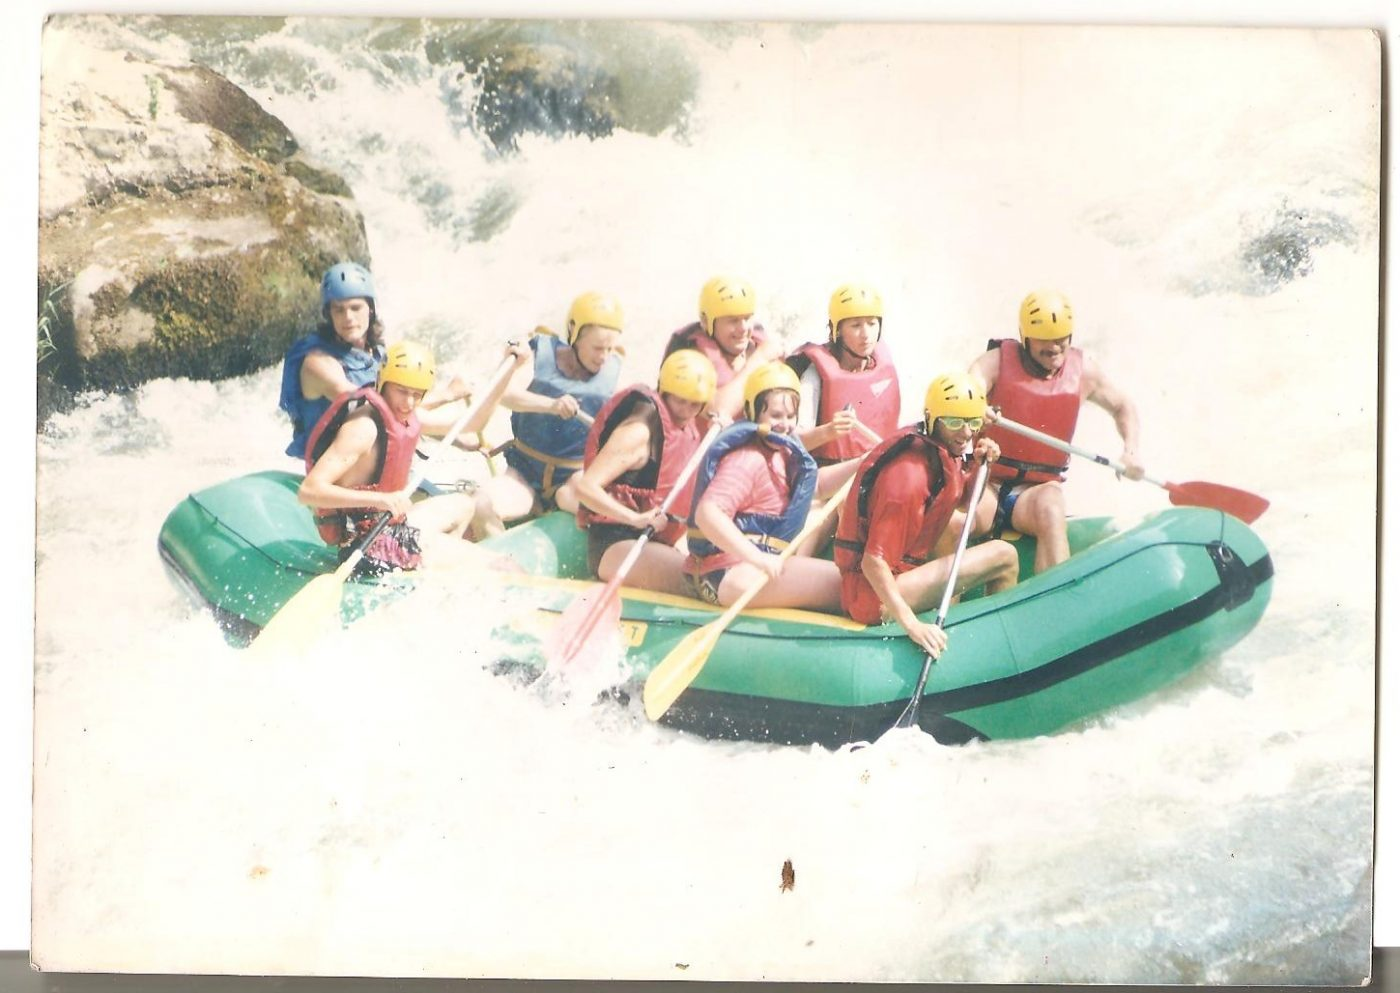 Rafting à lunettes